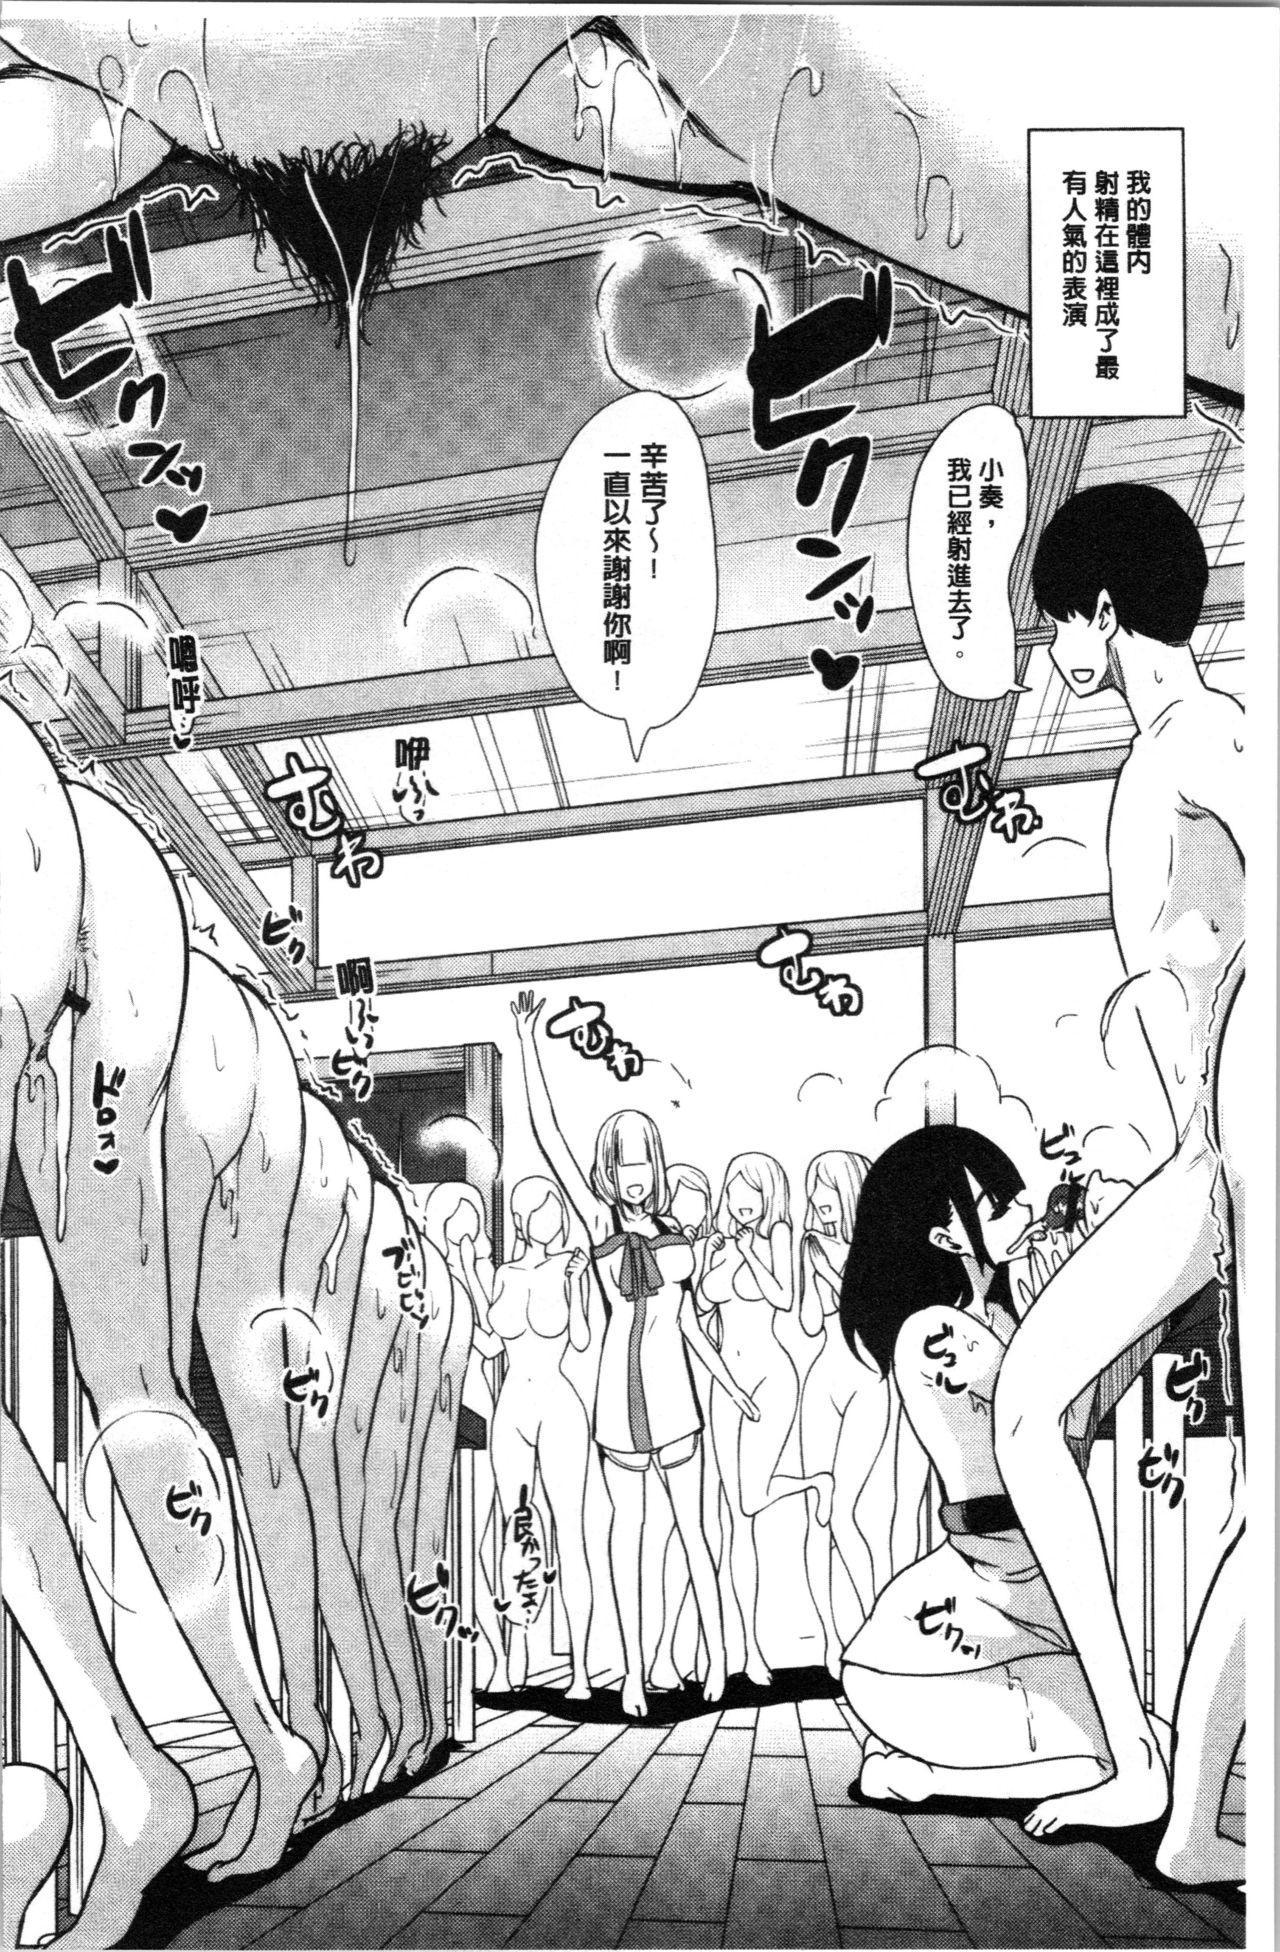 [Ootori Mahiro] Boku no Super Harem Sentou ~Otome no Naka ni Otoko wa Boku dake~ - My super harlem public bath, I am the only man in the public bath full of pussy cats. | 我的後宮選妃般的超級錢湯~乙女之間只有我一個男人~ [Chinese] 103